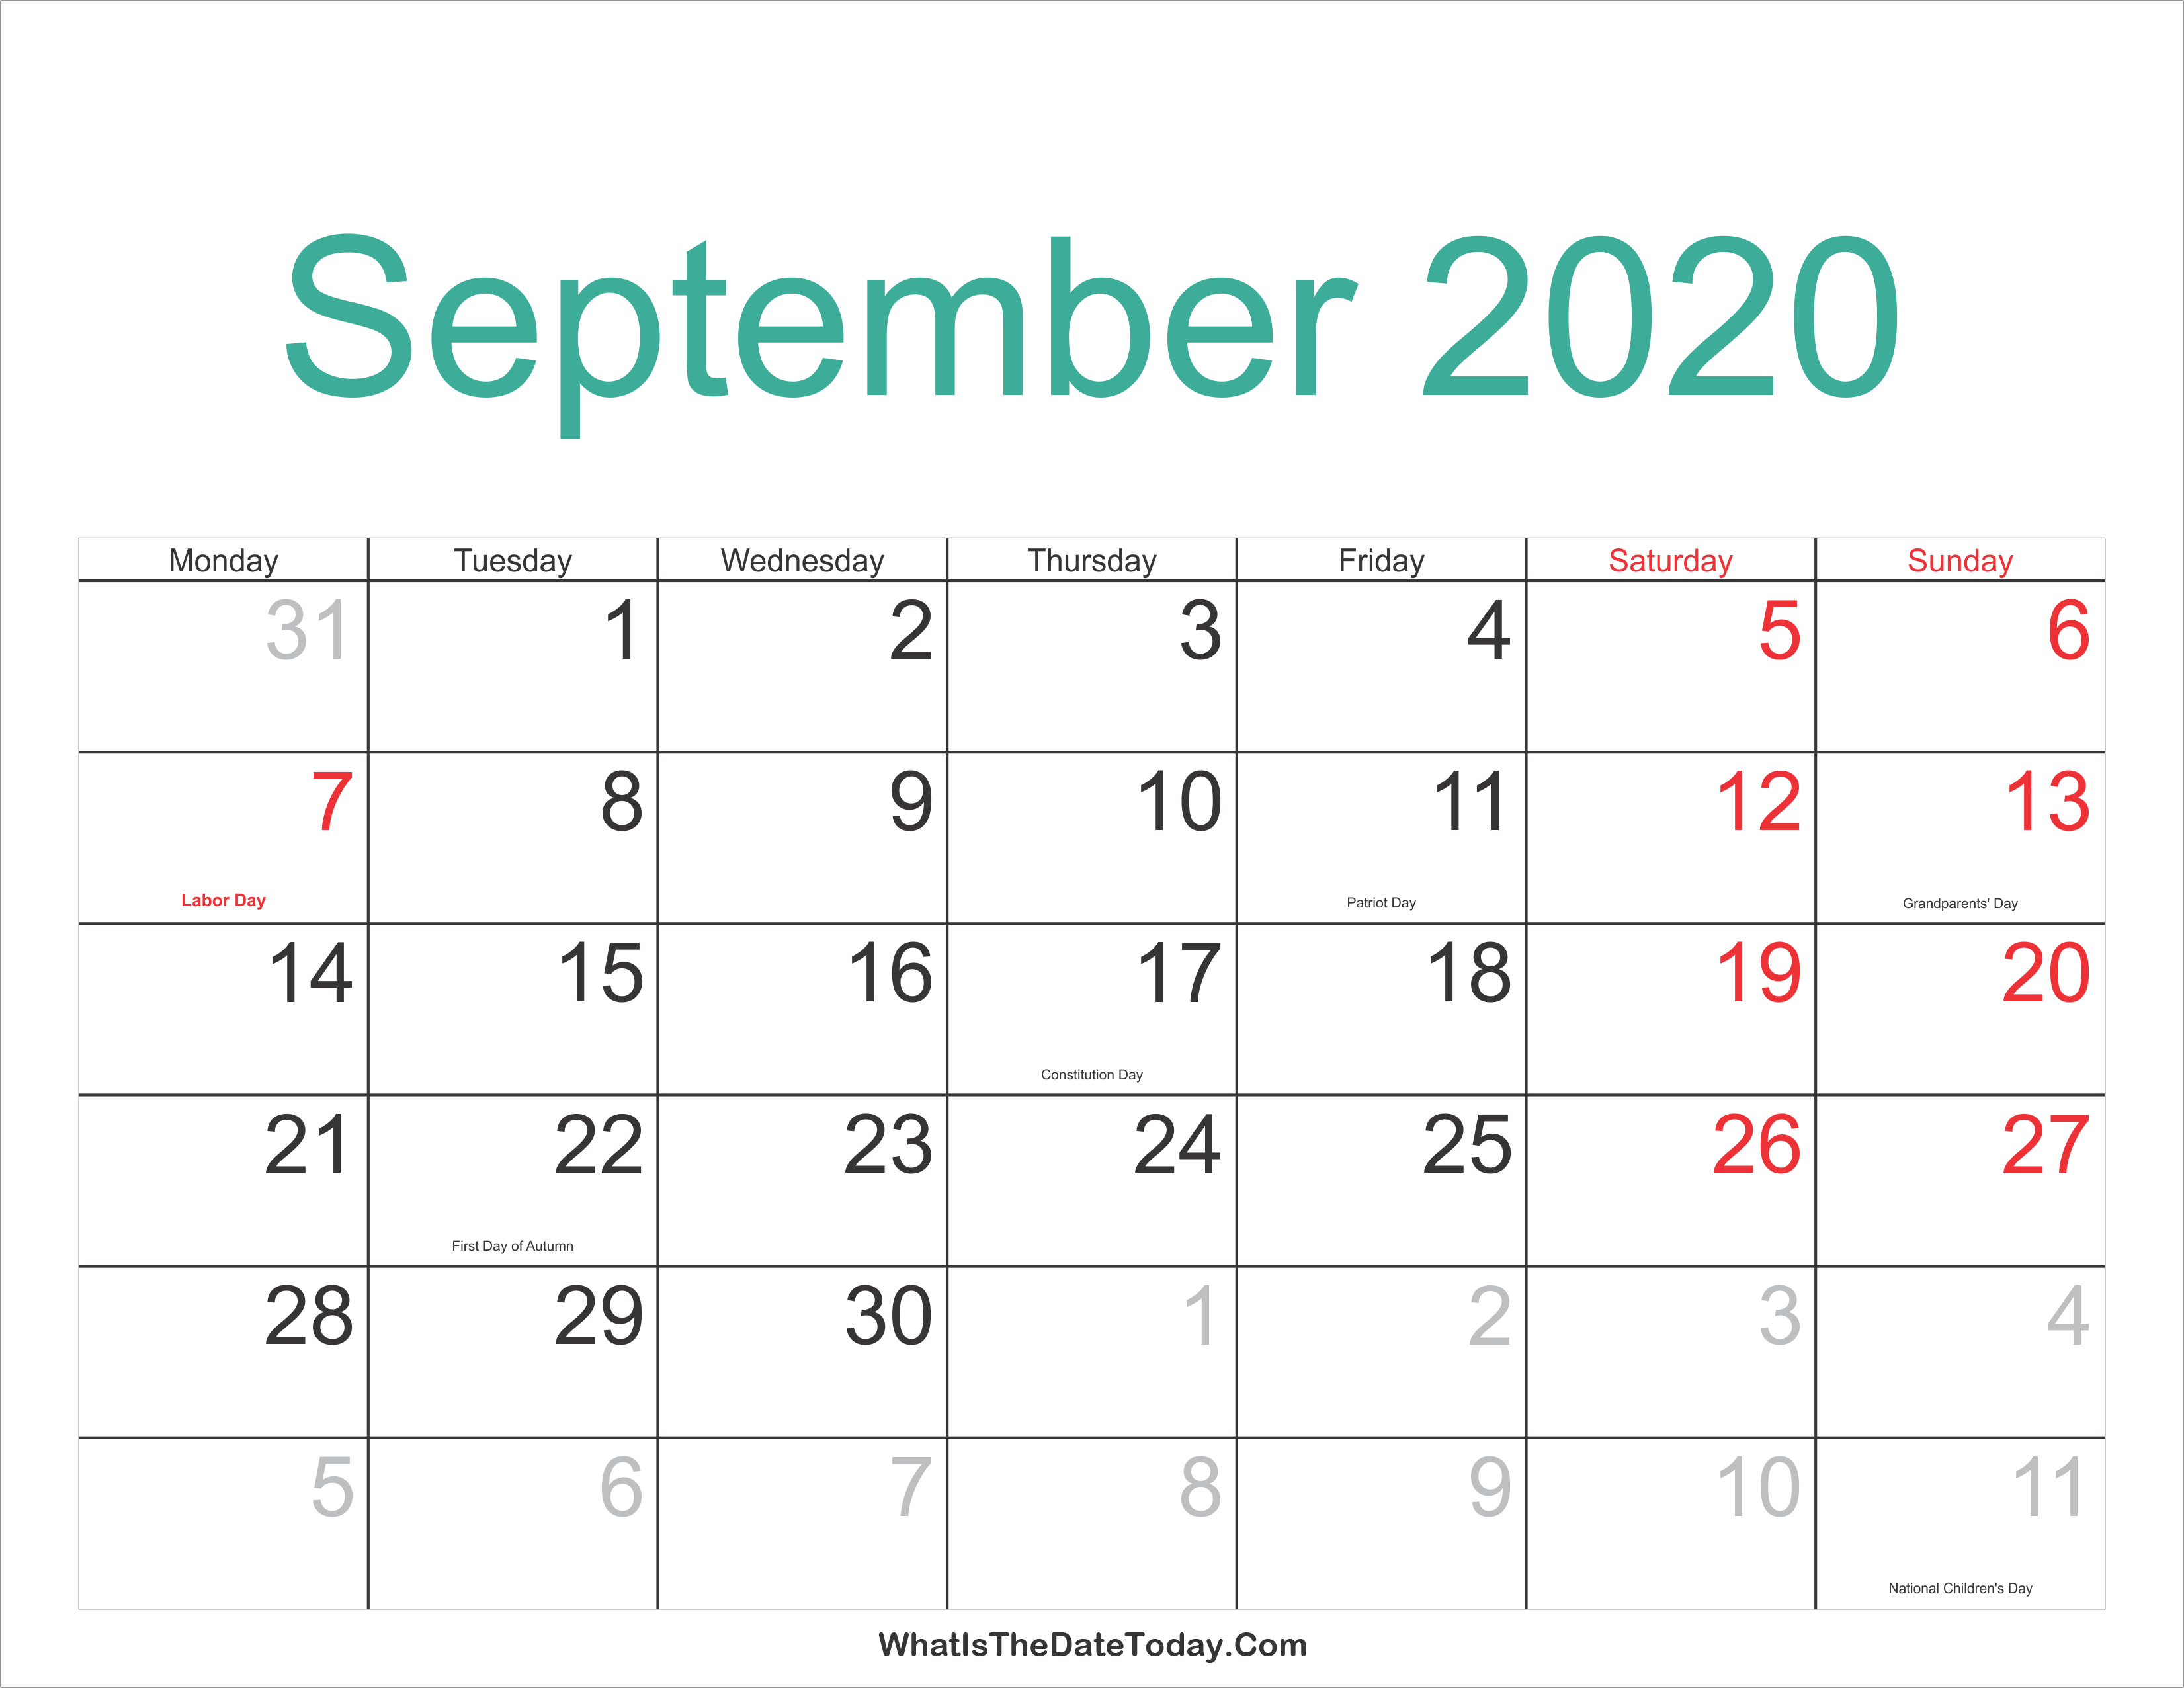 September 2020 Calendar With Holidays September 2020 Calendar Printable with Holidays